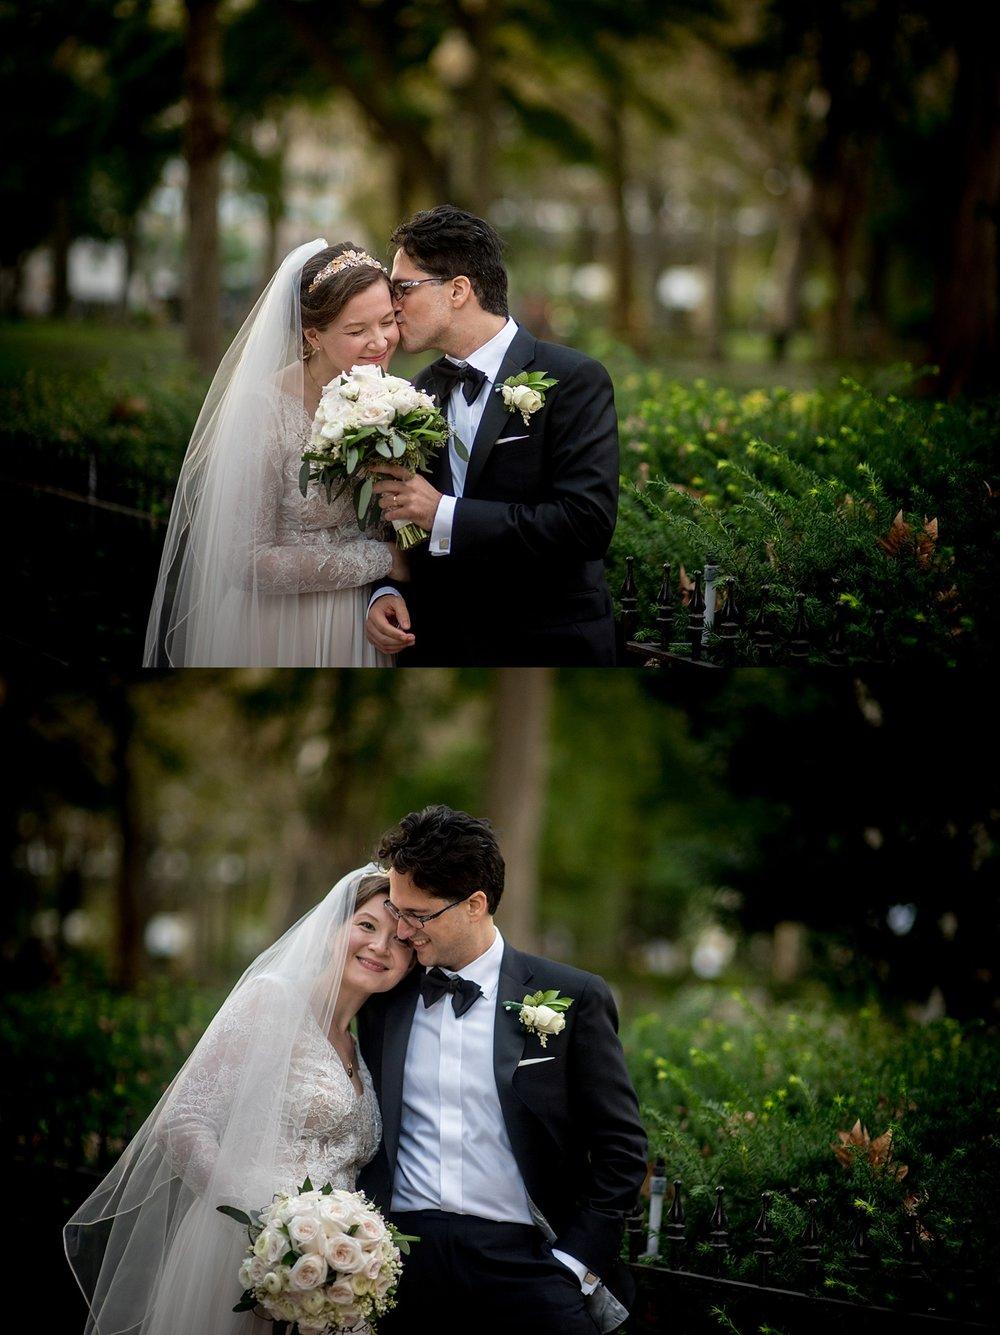 philadelphia wedding photography cherie_0043.jpg